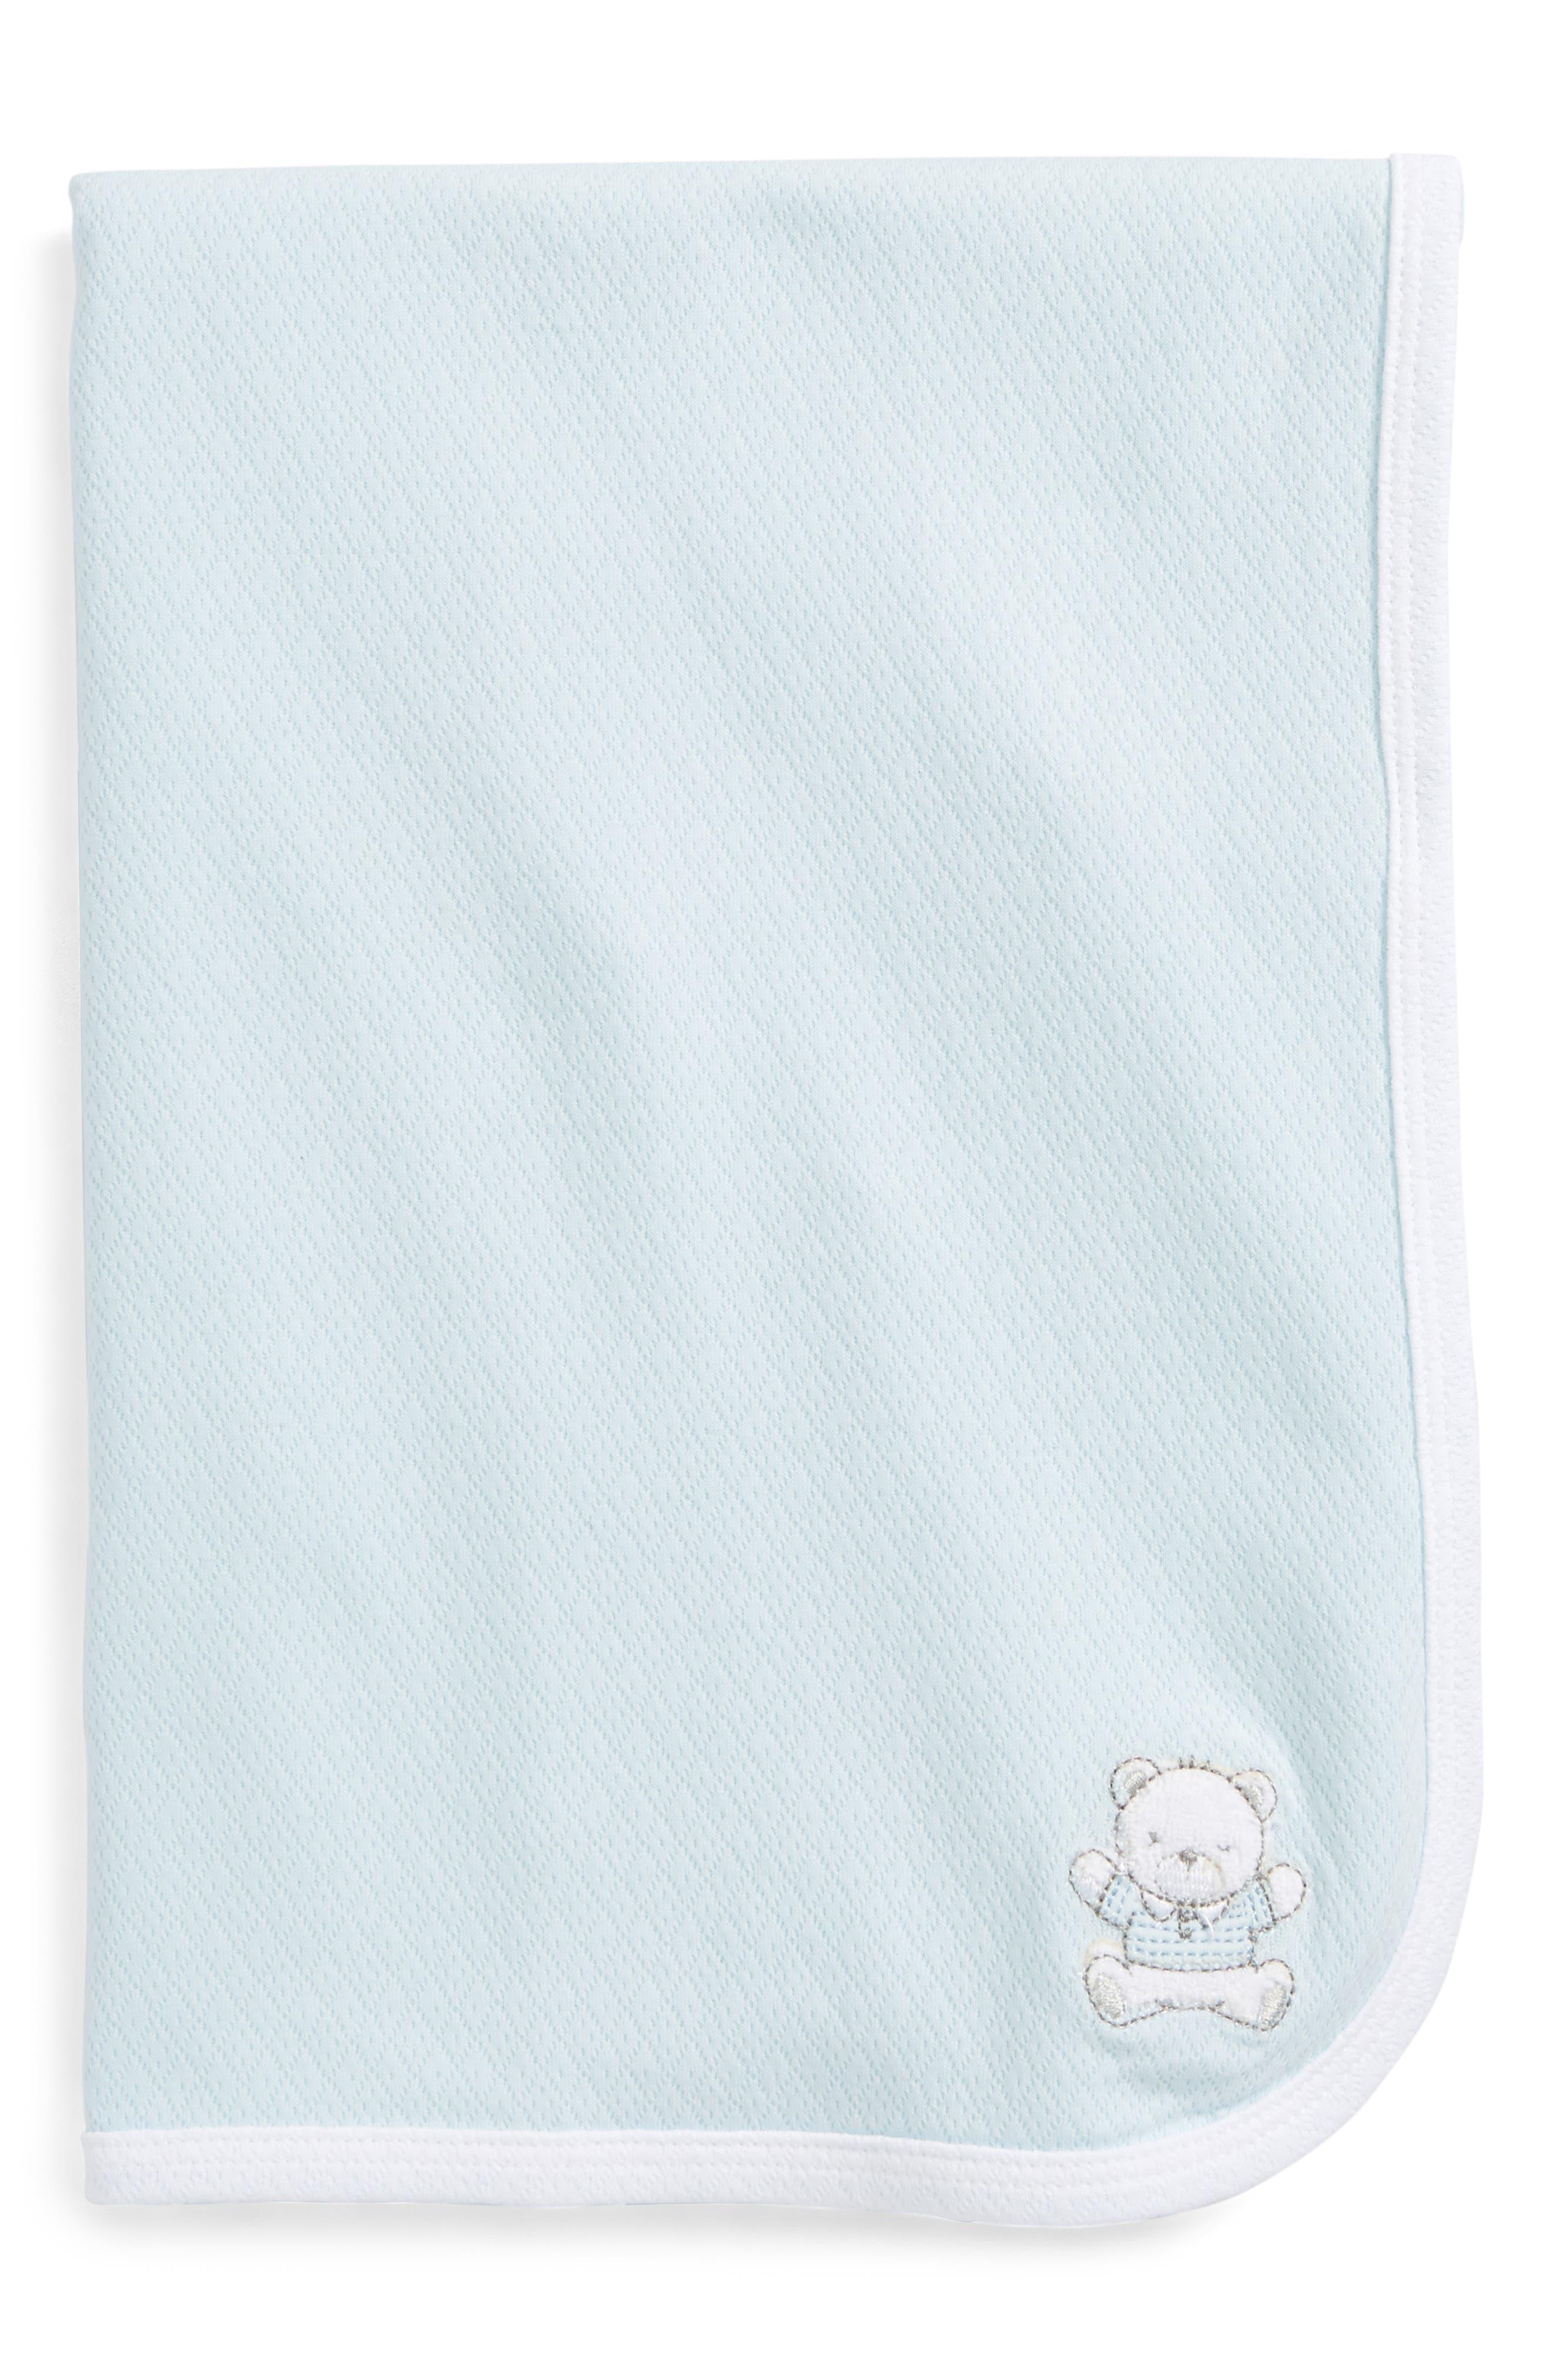 Bear Receiving Blanket,                         Main,                         color, LIGHT BLUE